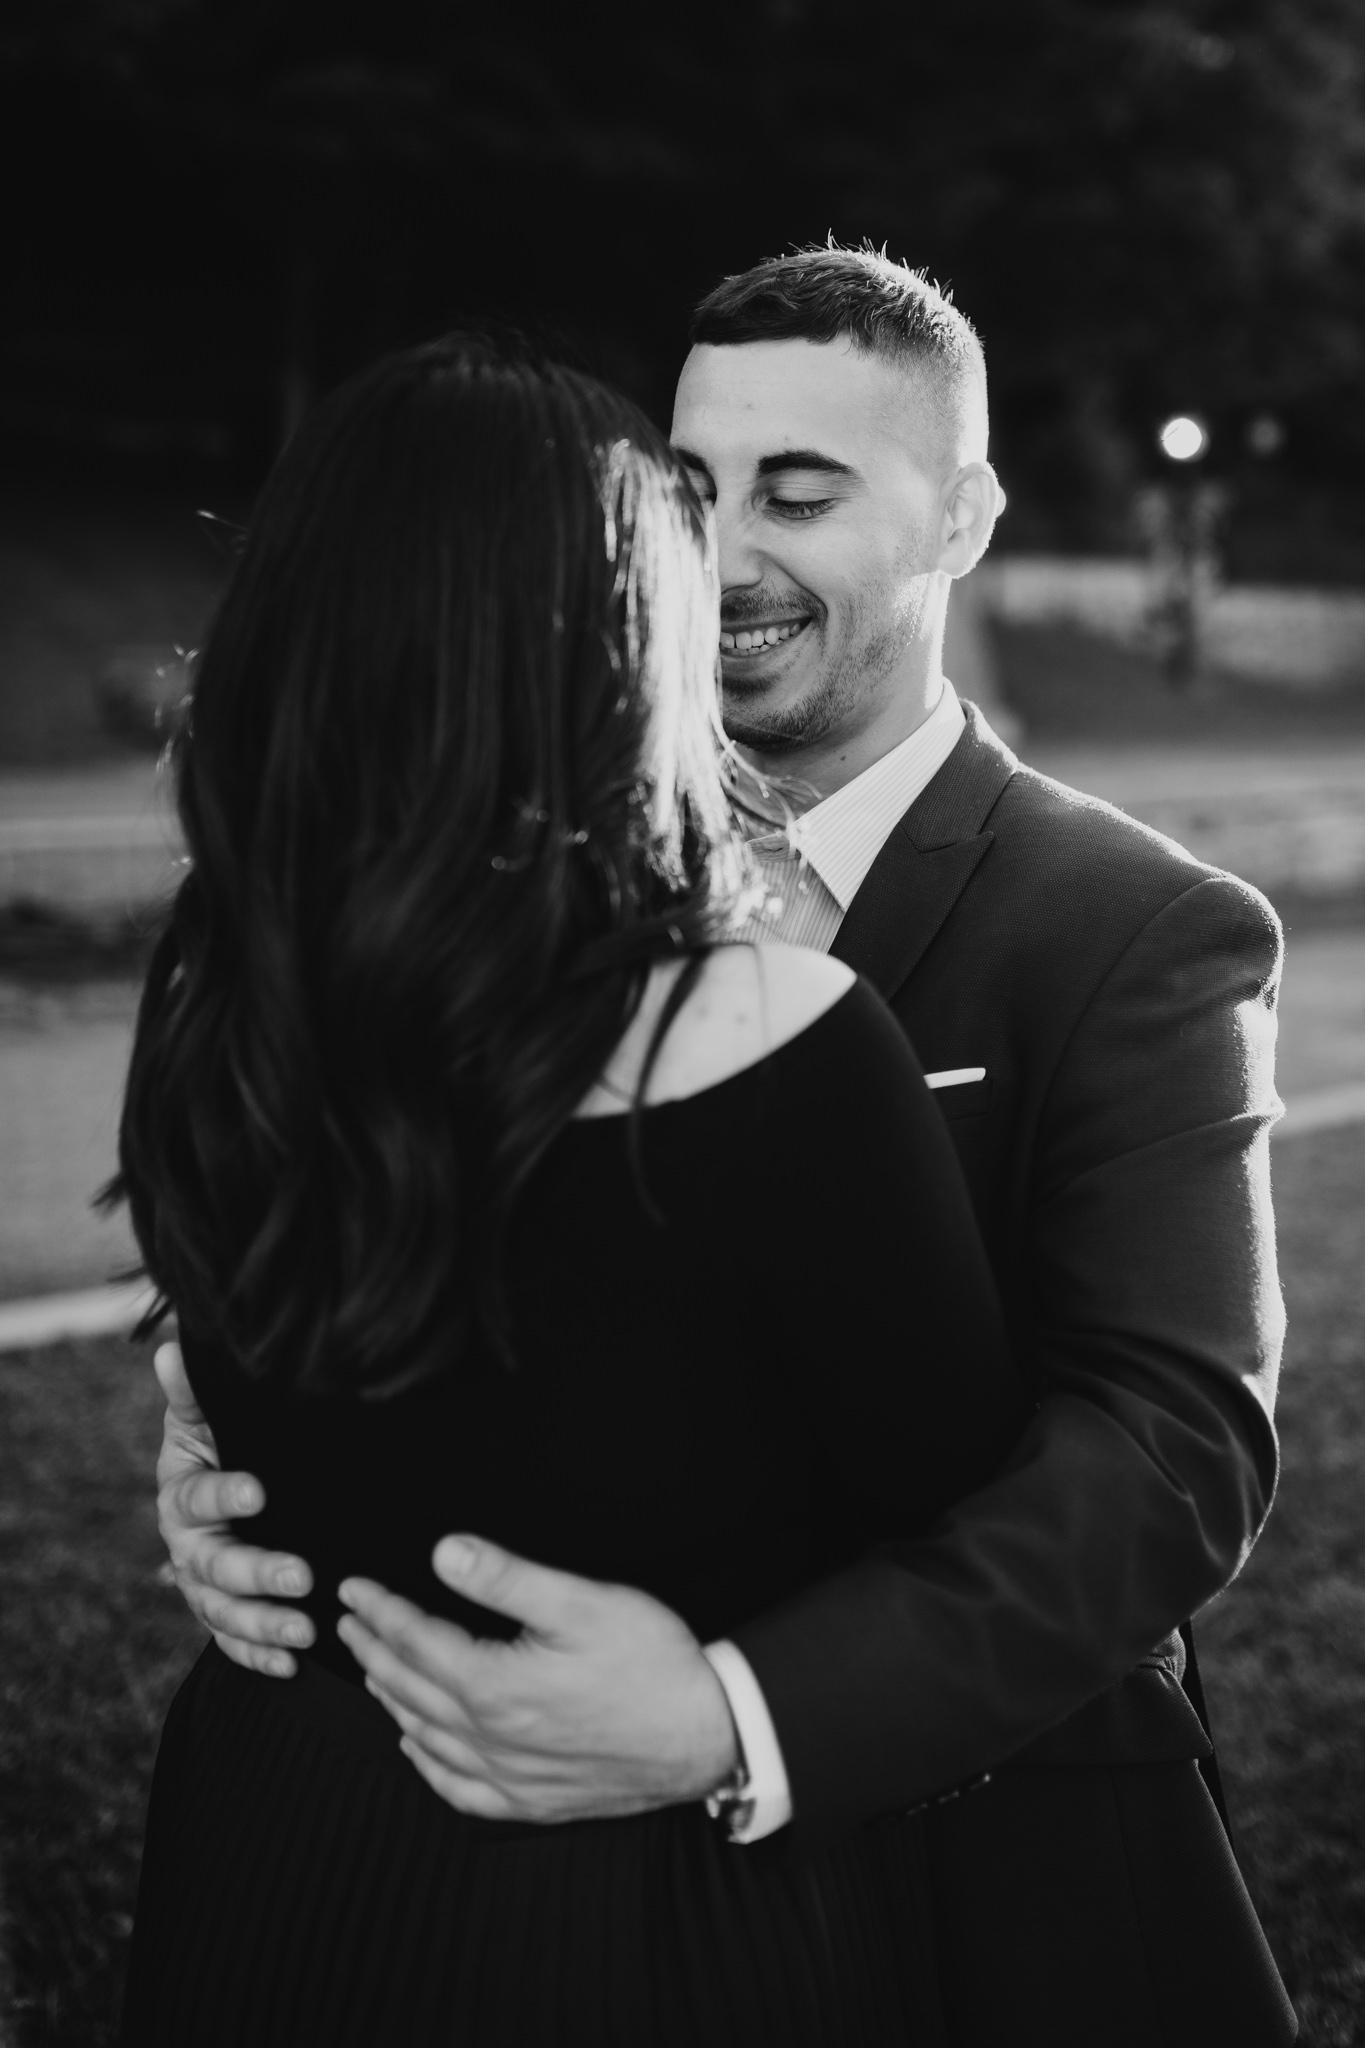 Classy, romantic, moody wedding and engagement portraiture